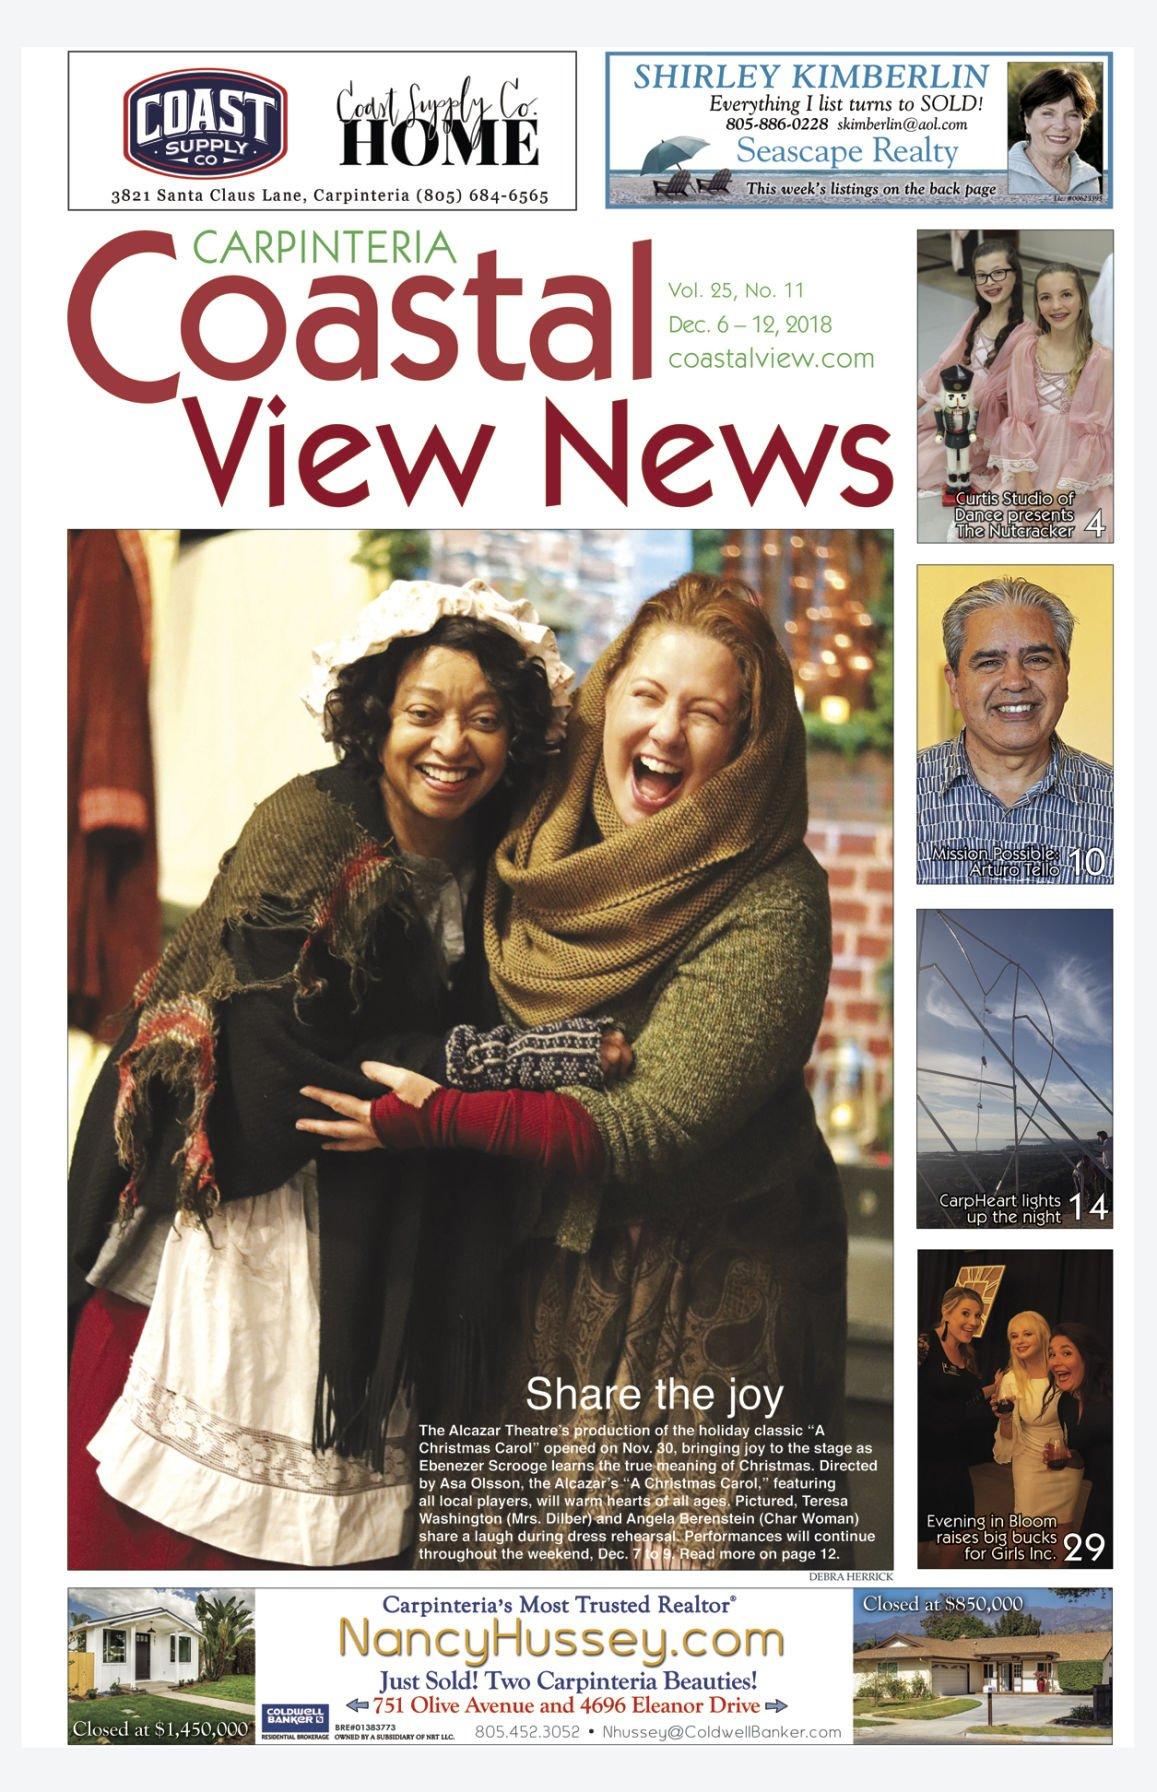 Coastal View News • December 6, 2018